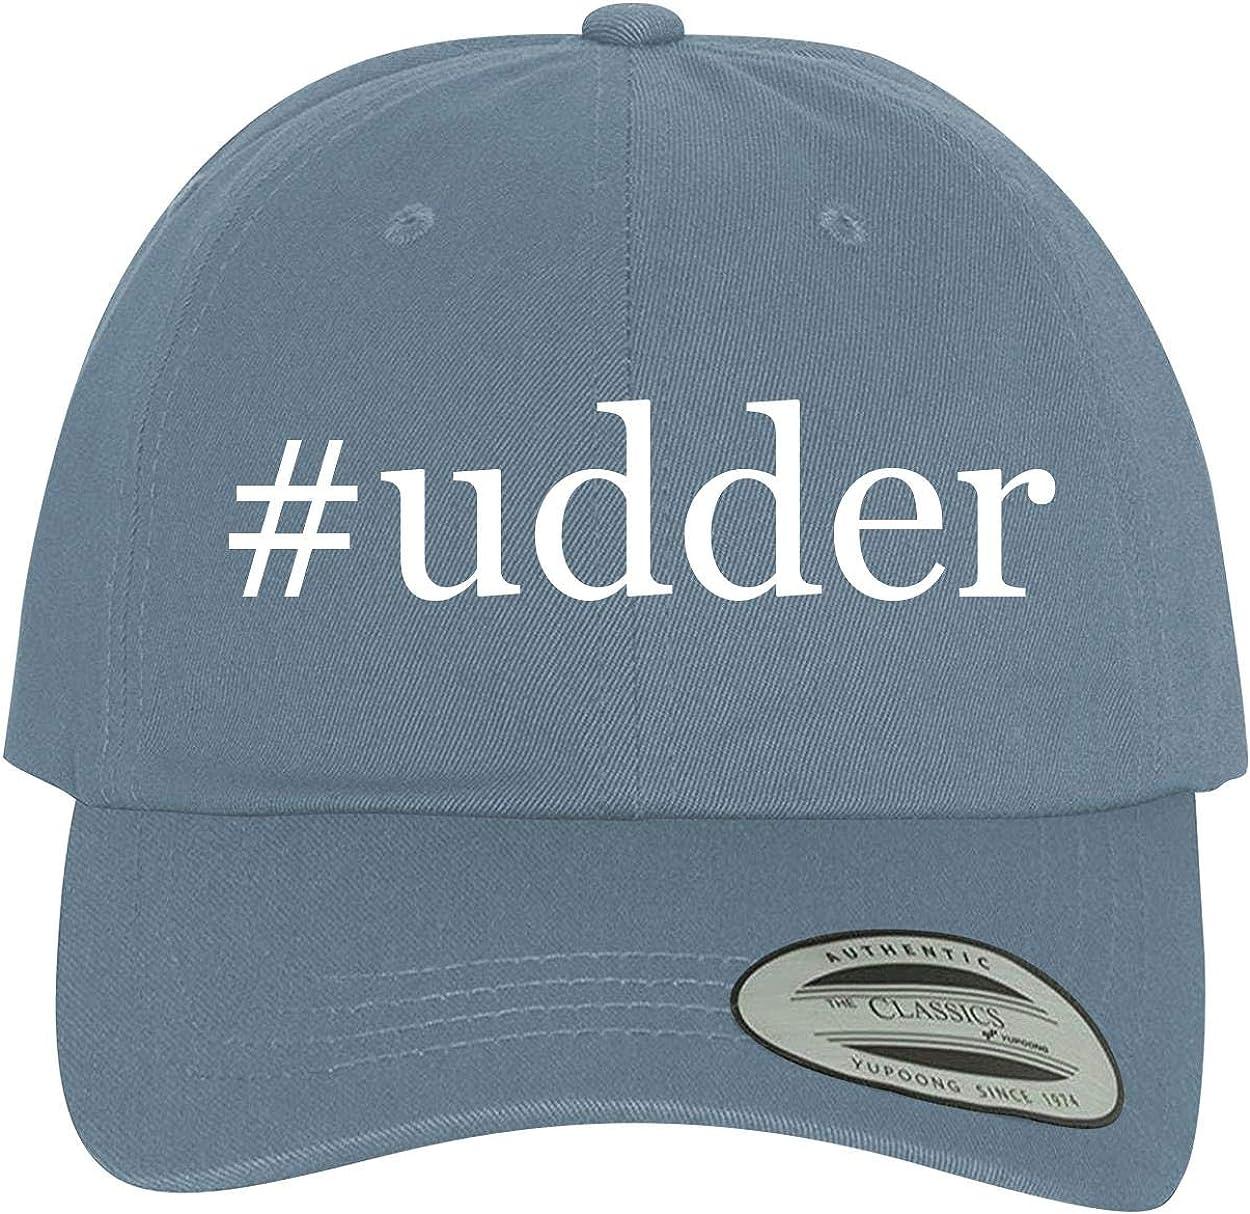 Comfortable Dad Hat Baseball Cap BH Cool Designs #Udder